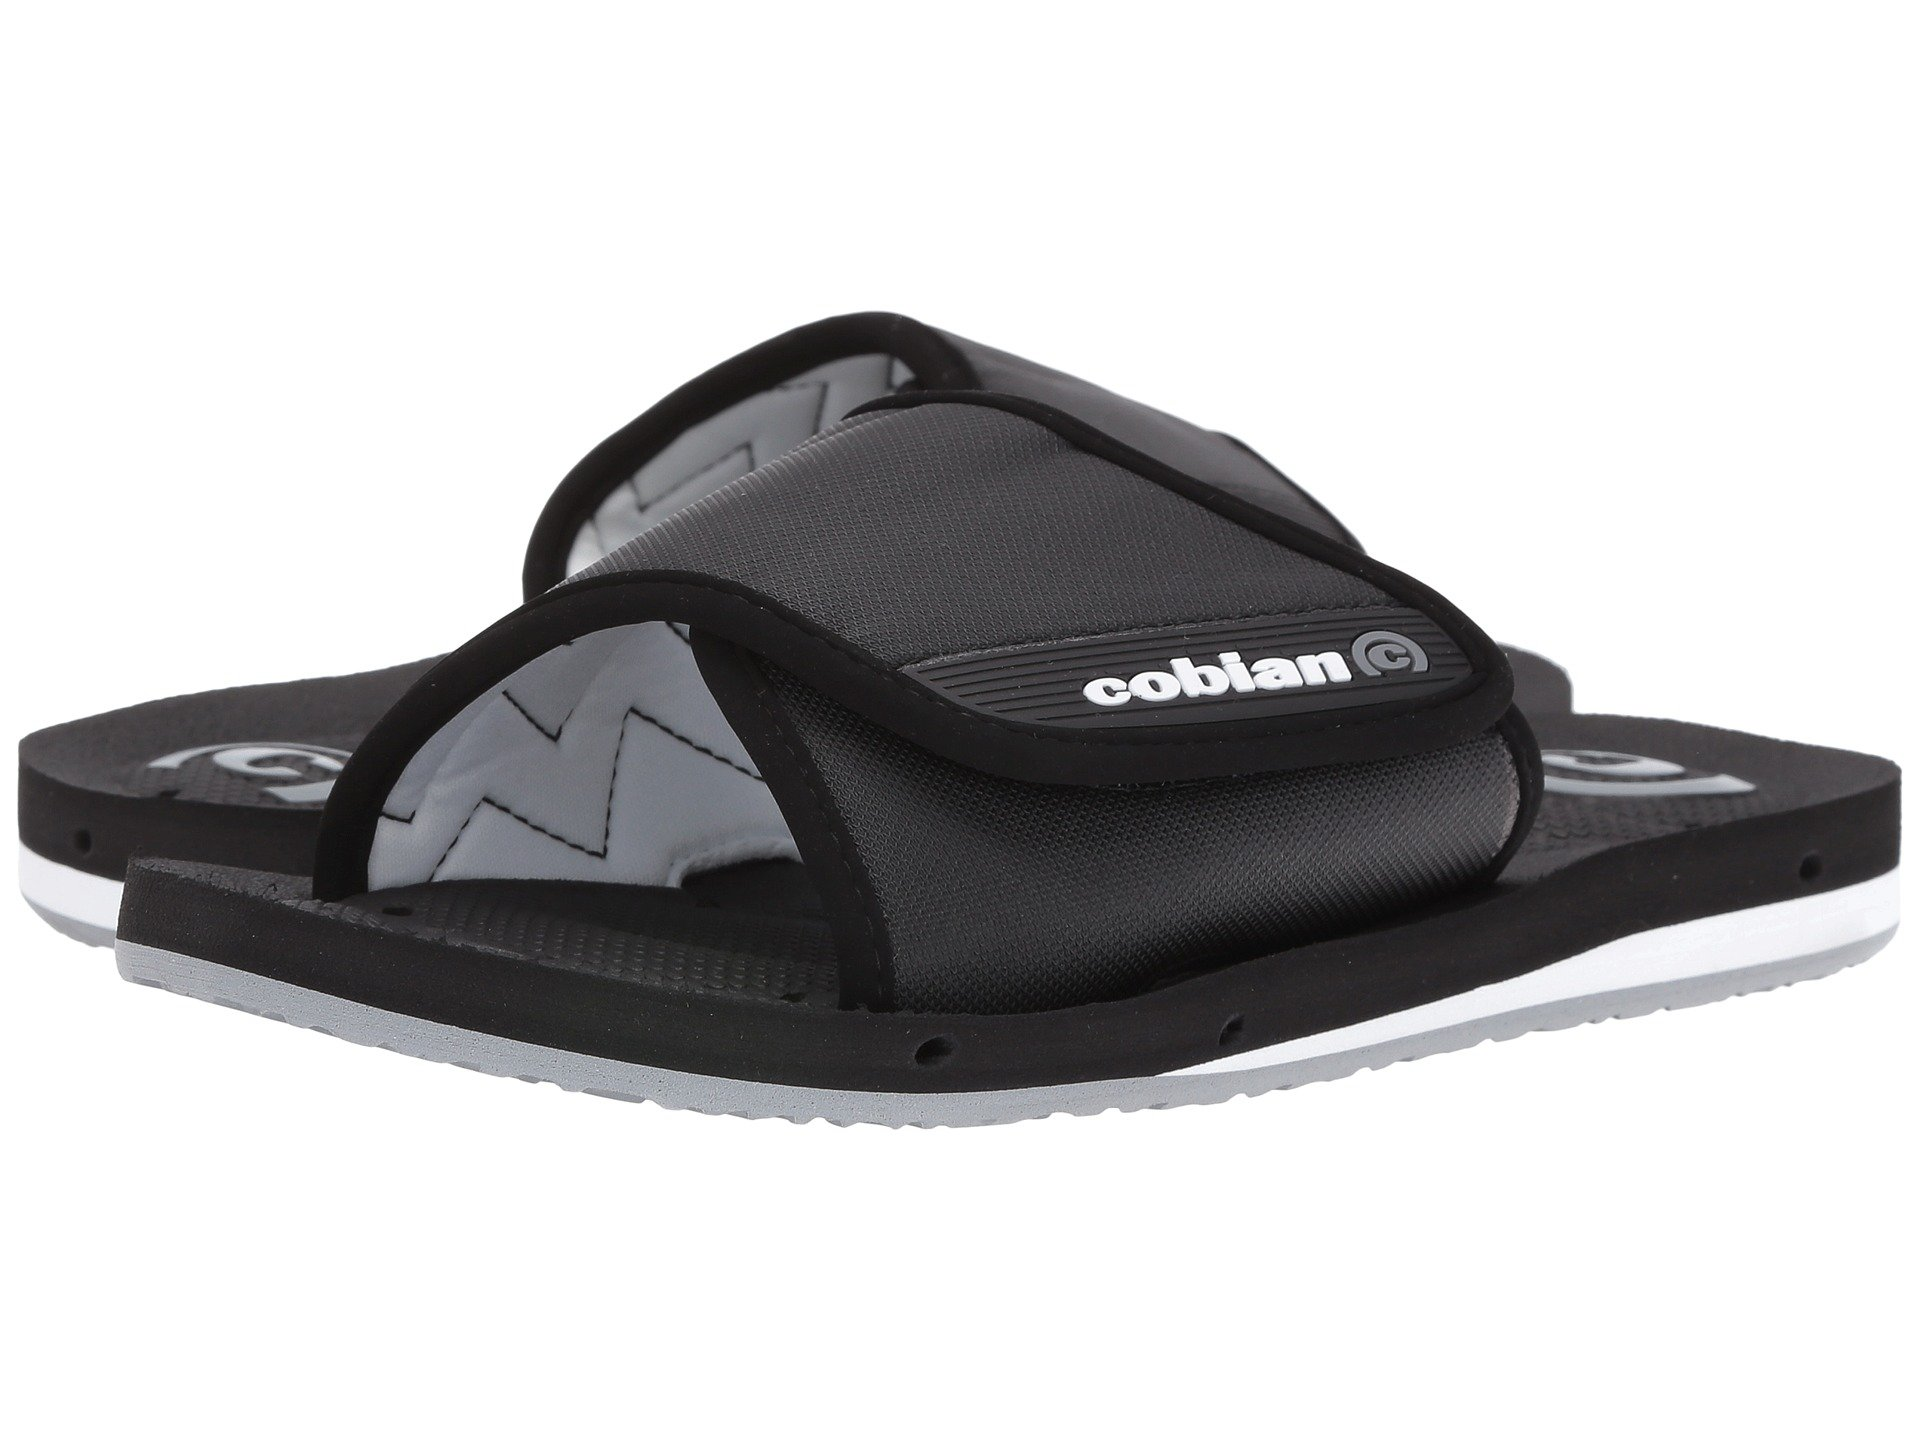 699605d9dfaa Men s Cobian Sandals + FREE SHIPPING